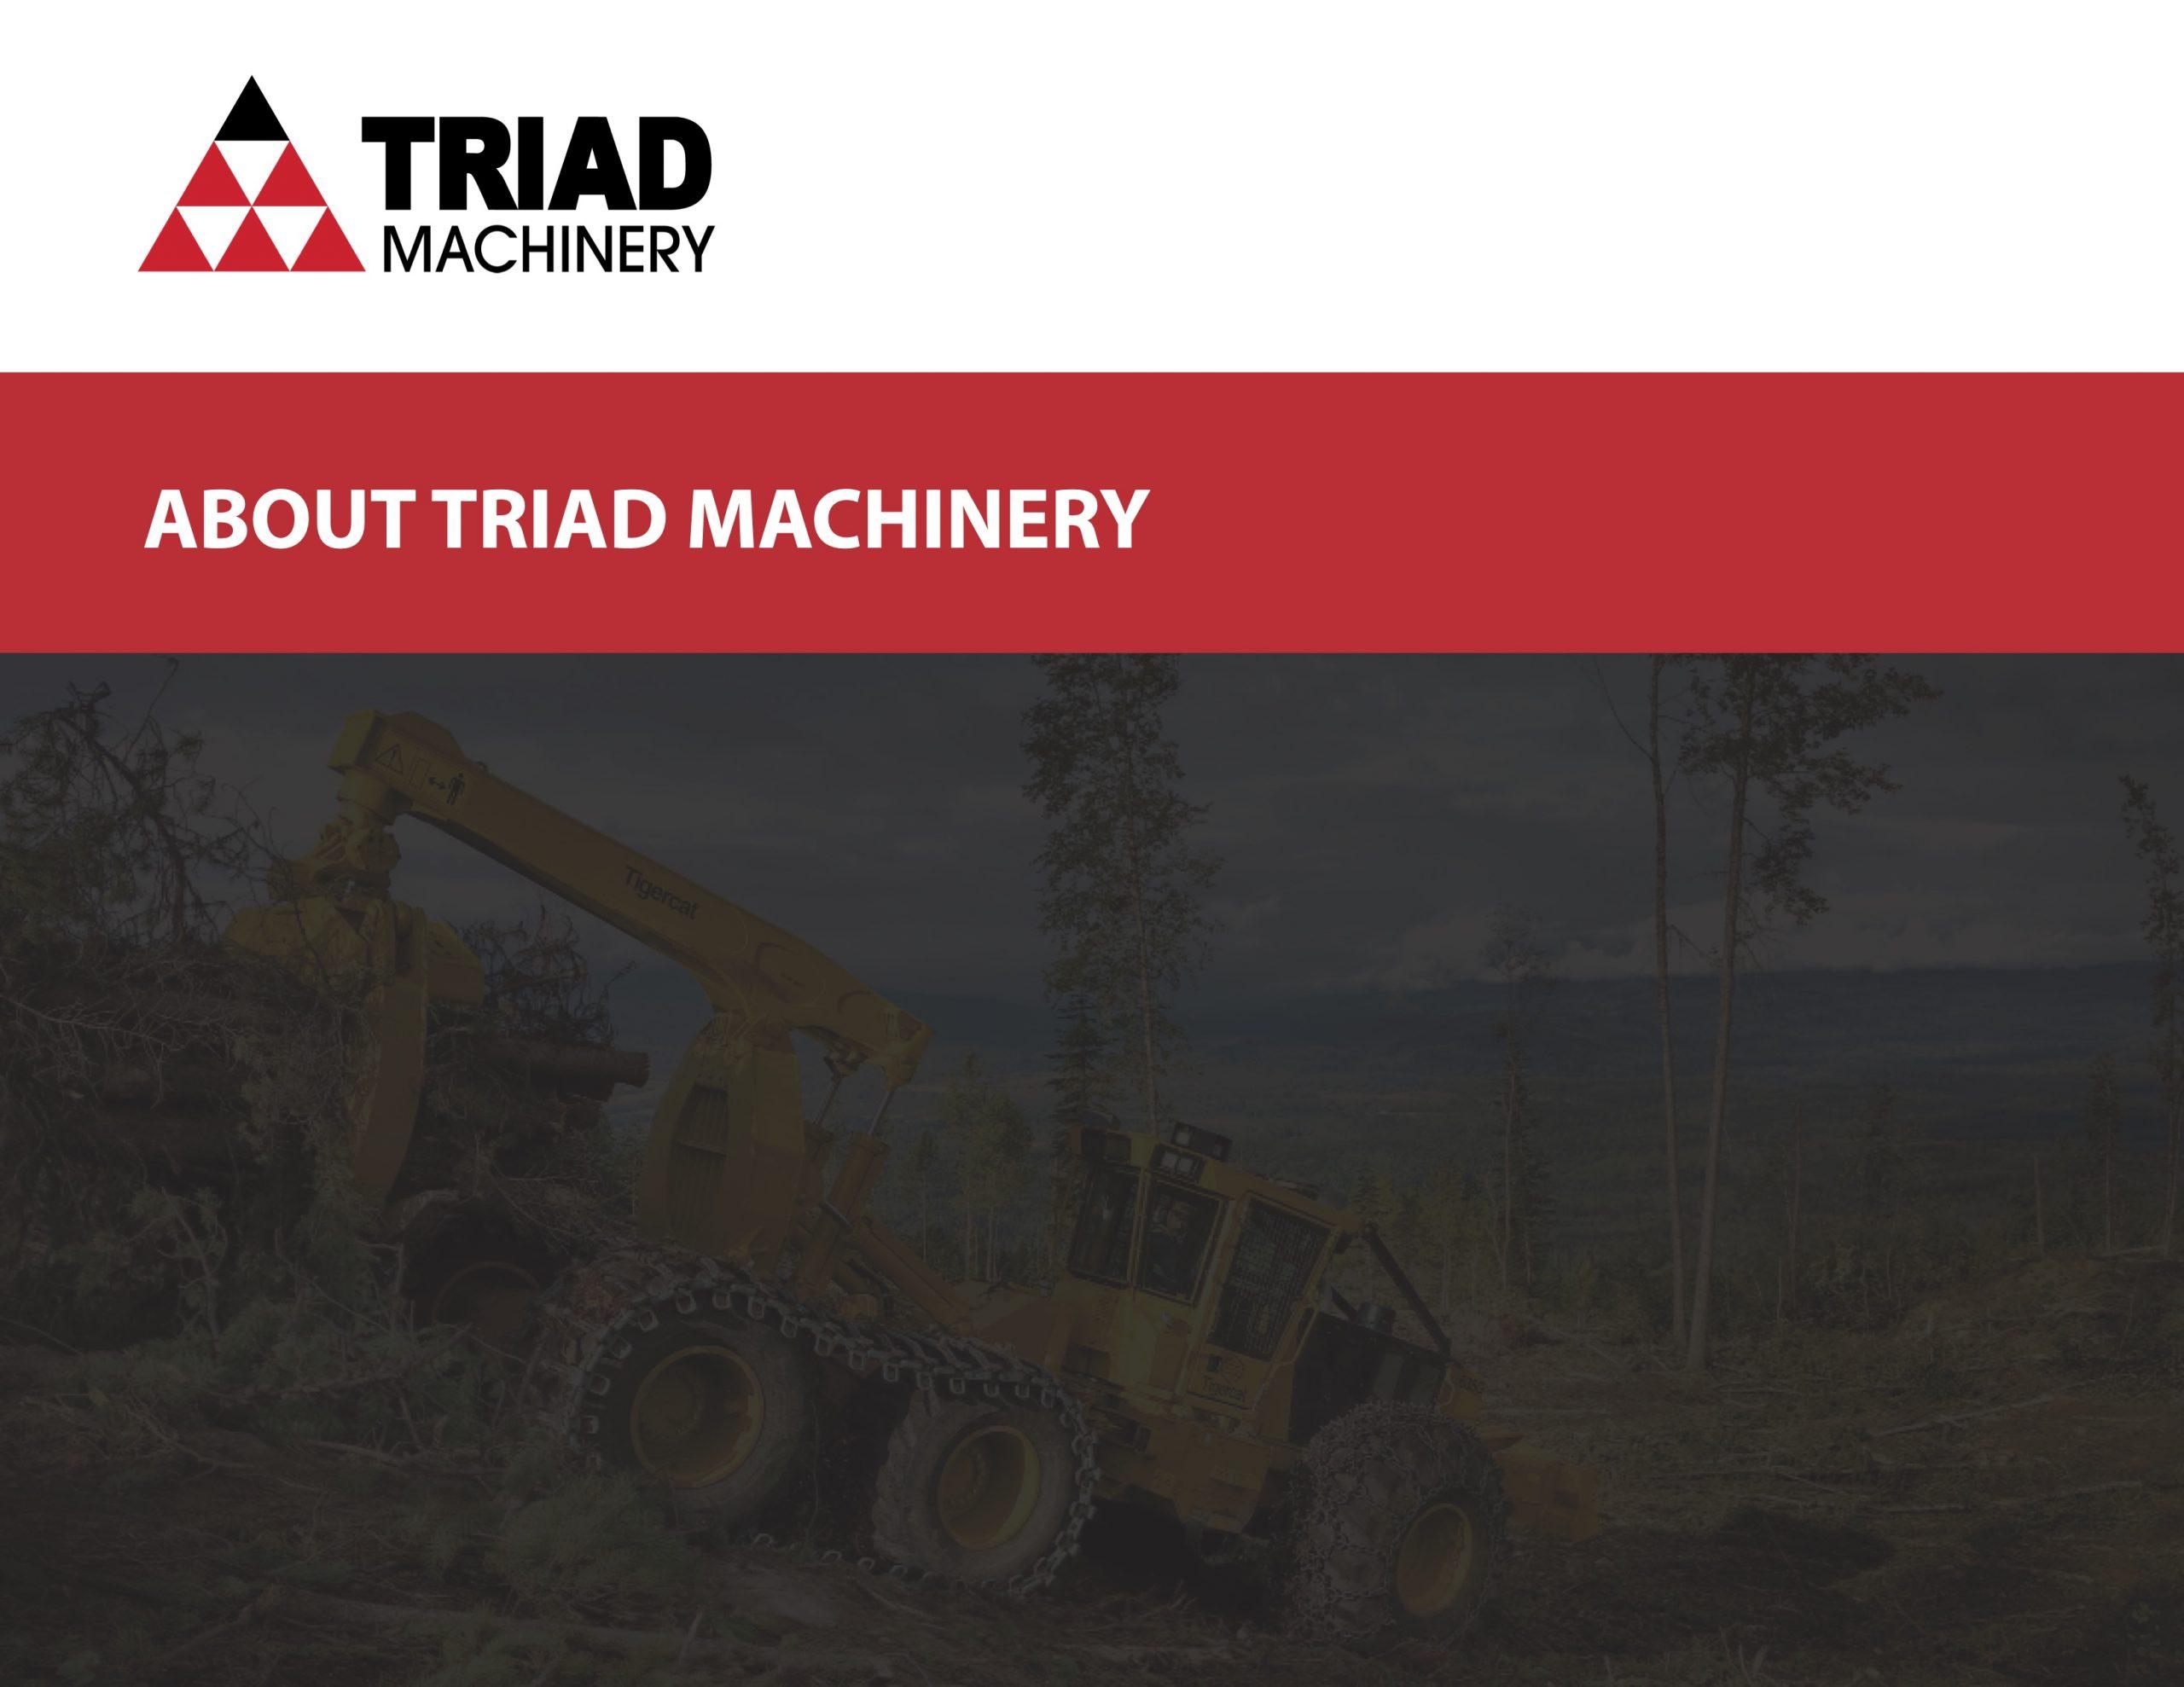 triad-machinery-brand-book-v5-1